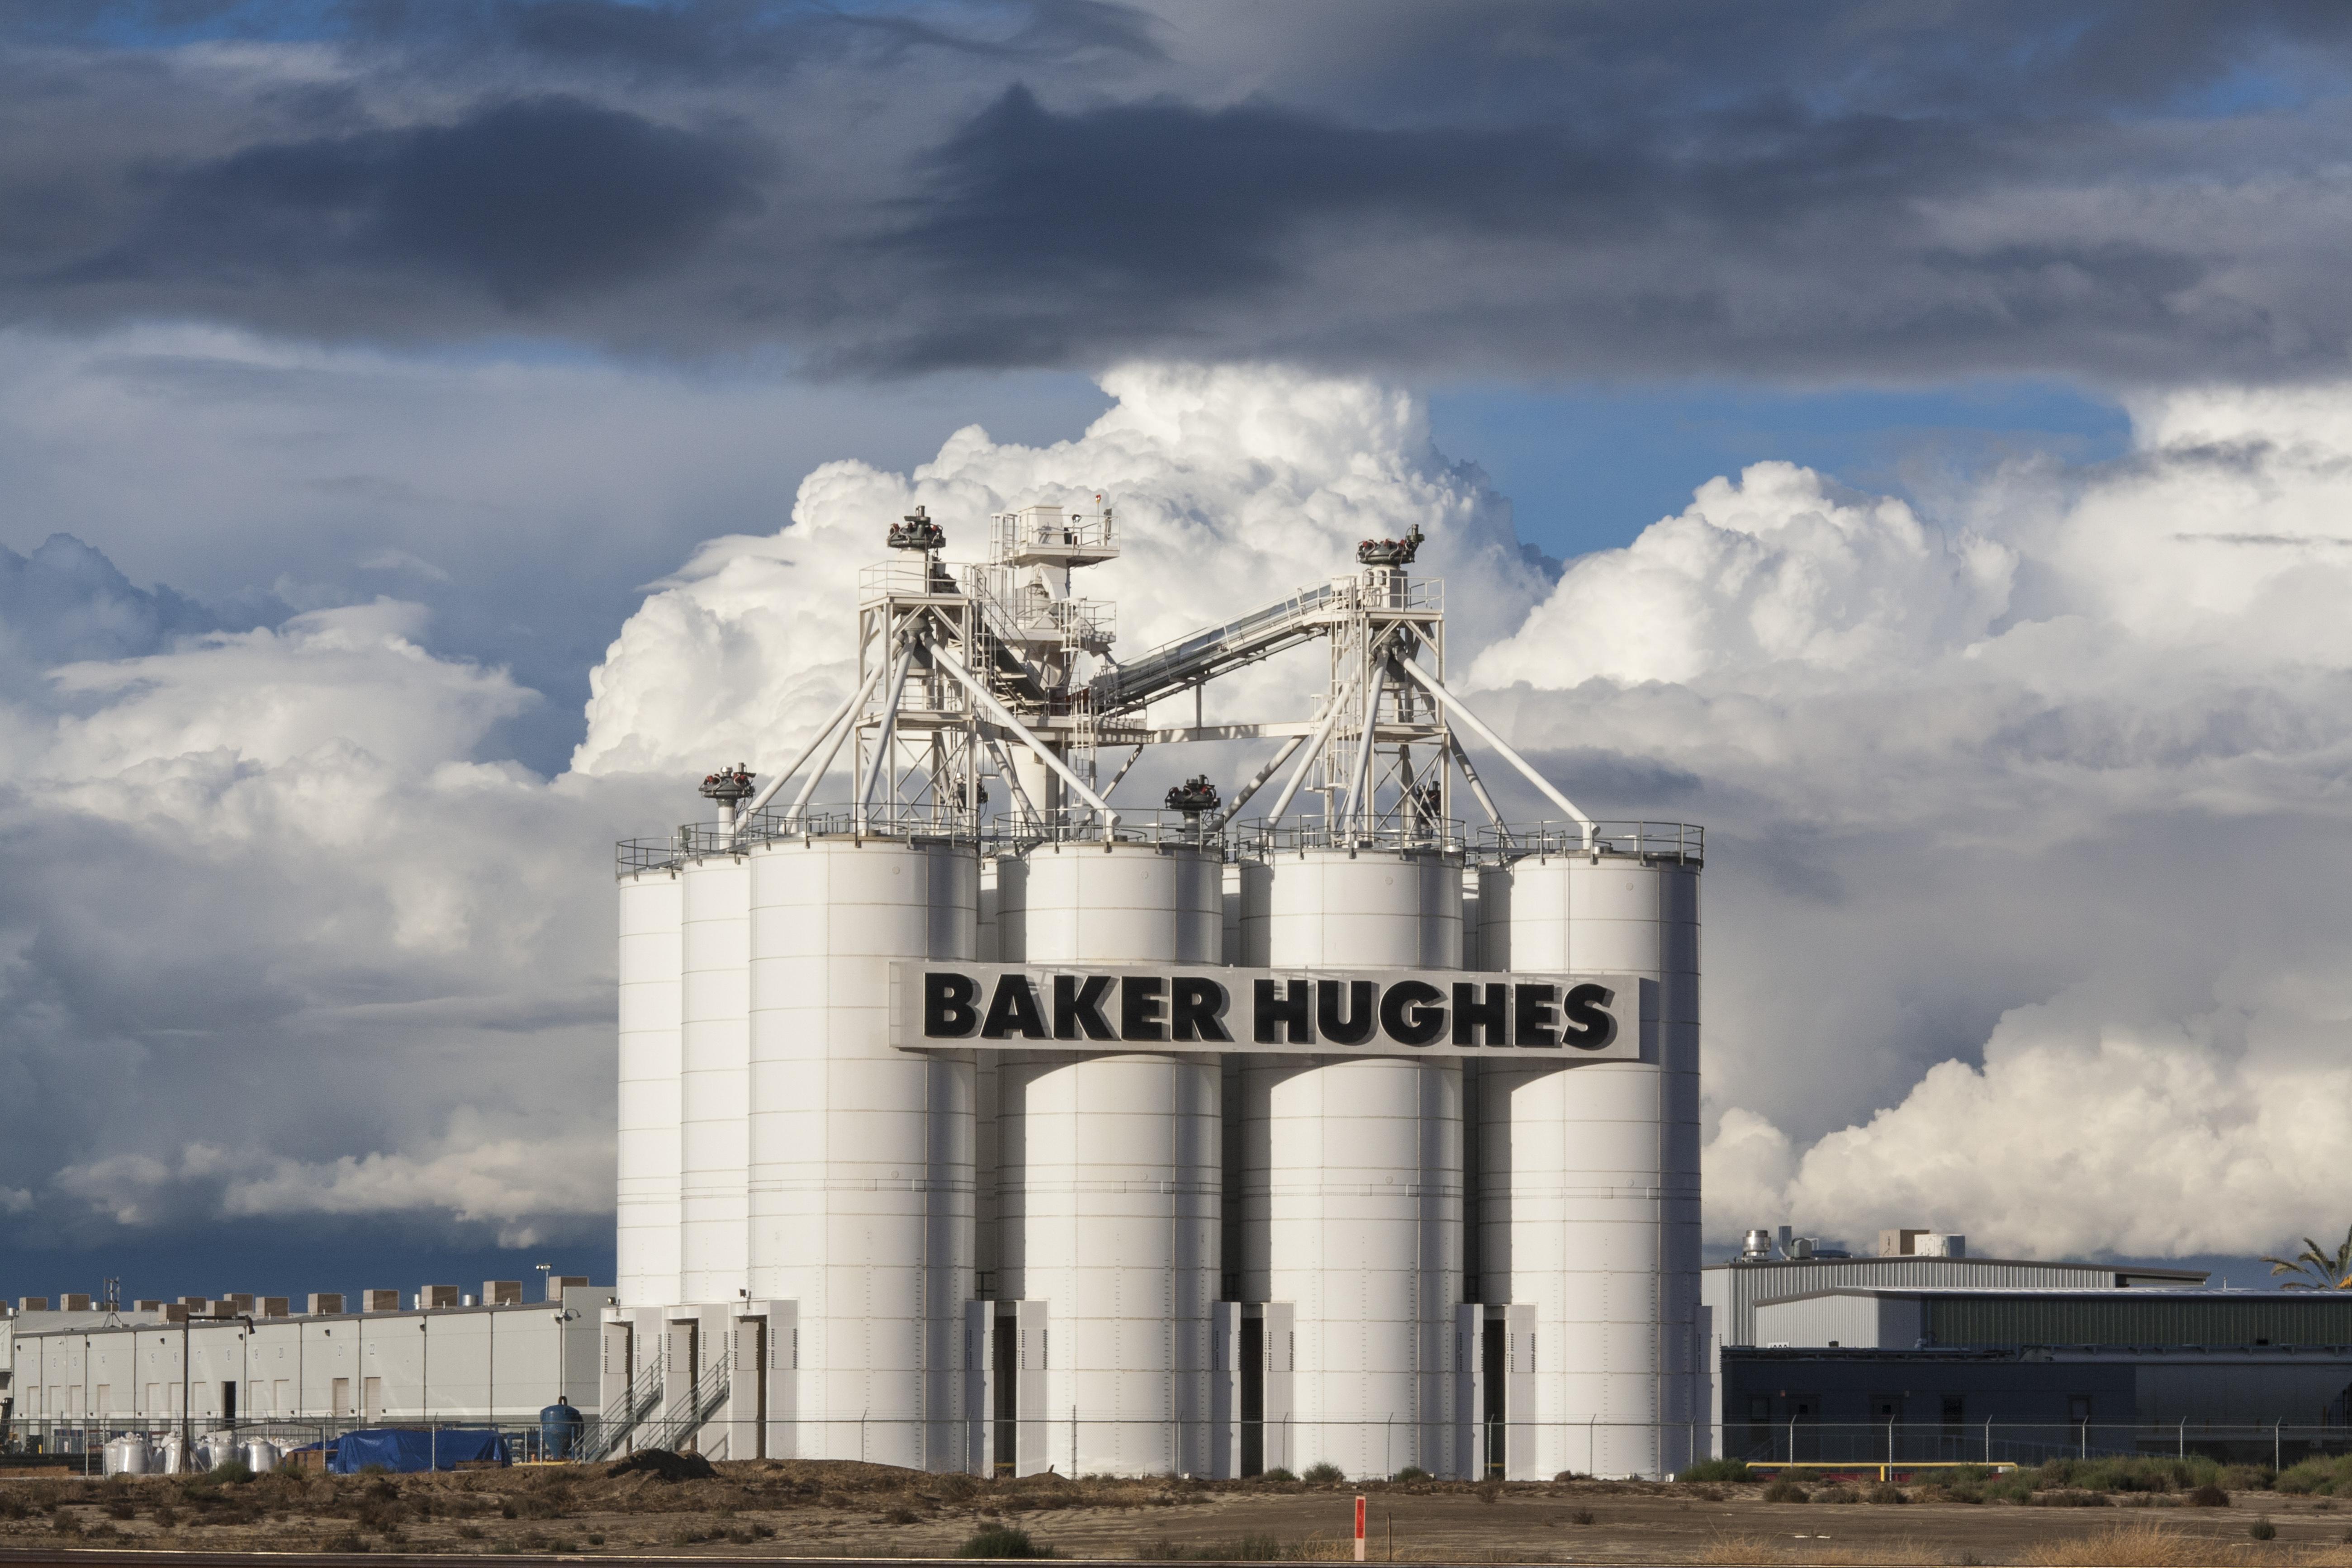 Bakersfield headquarters of Baker Hughes